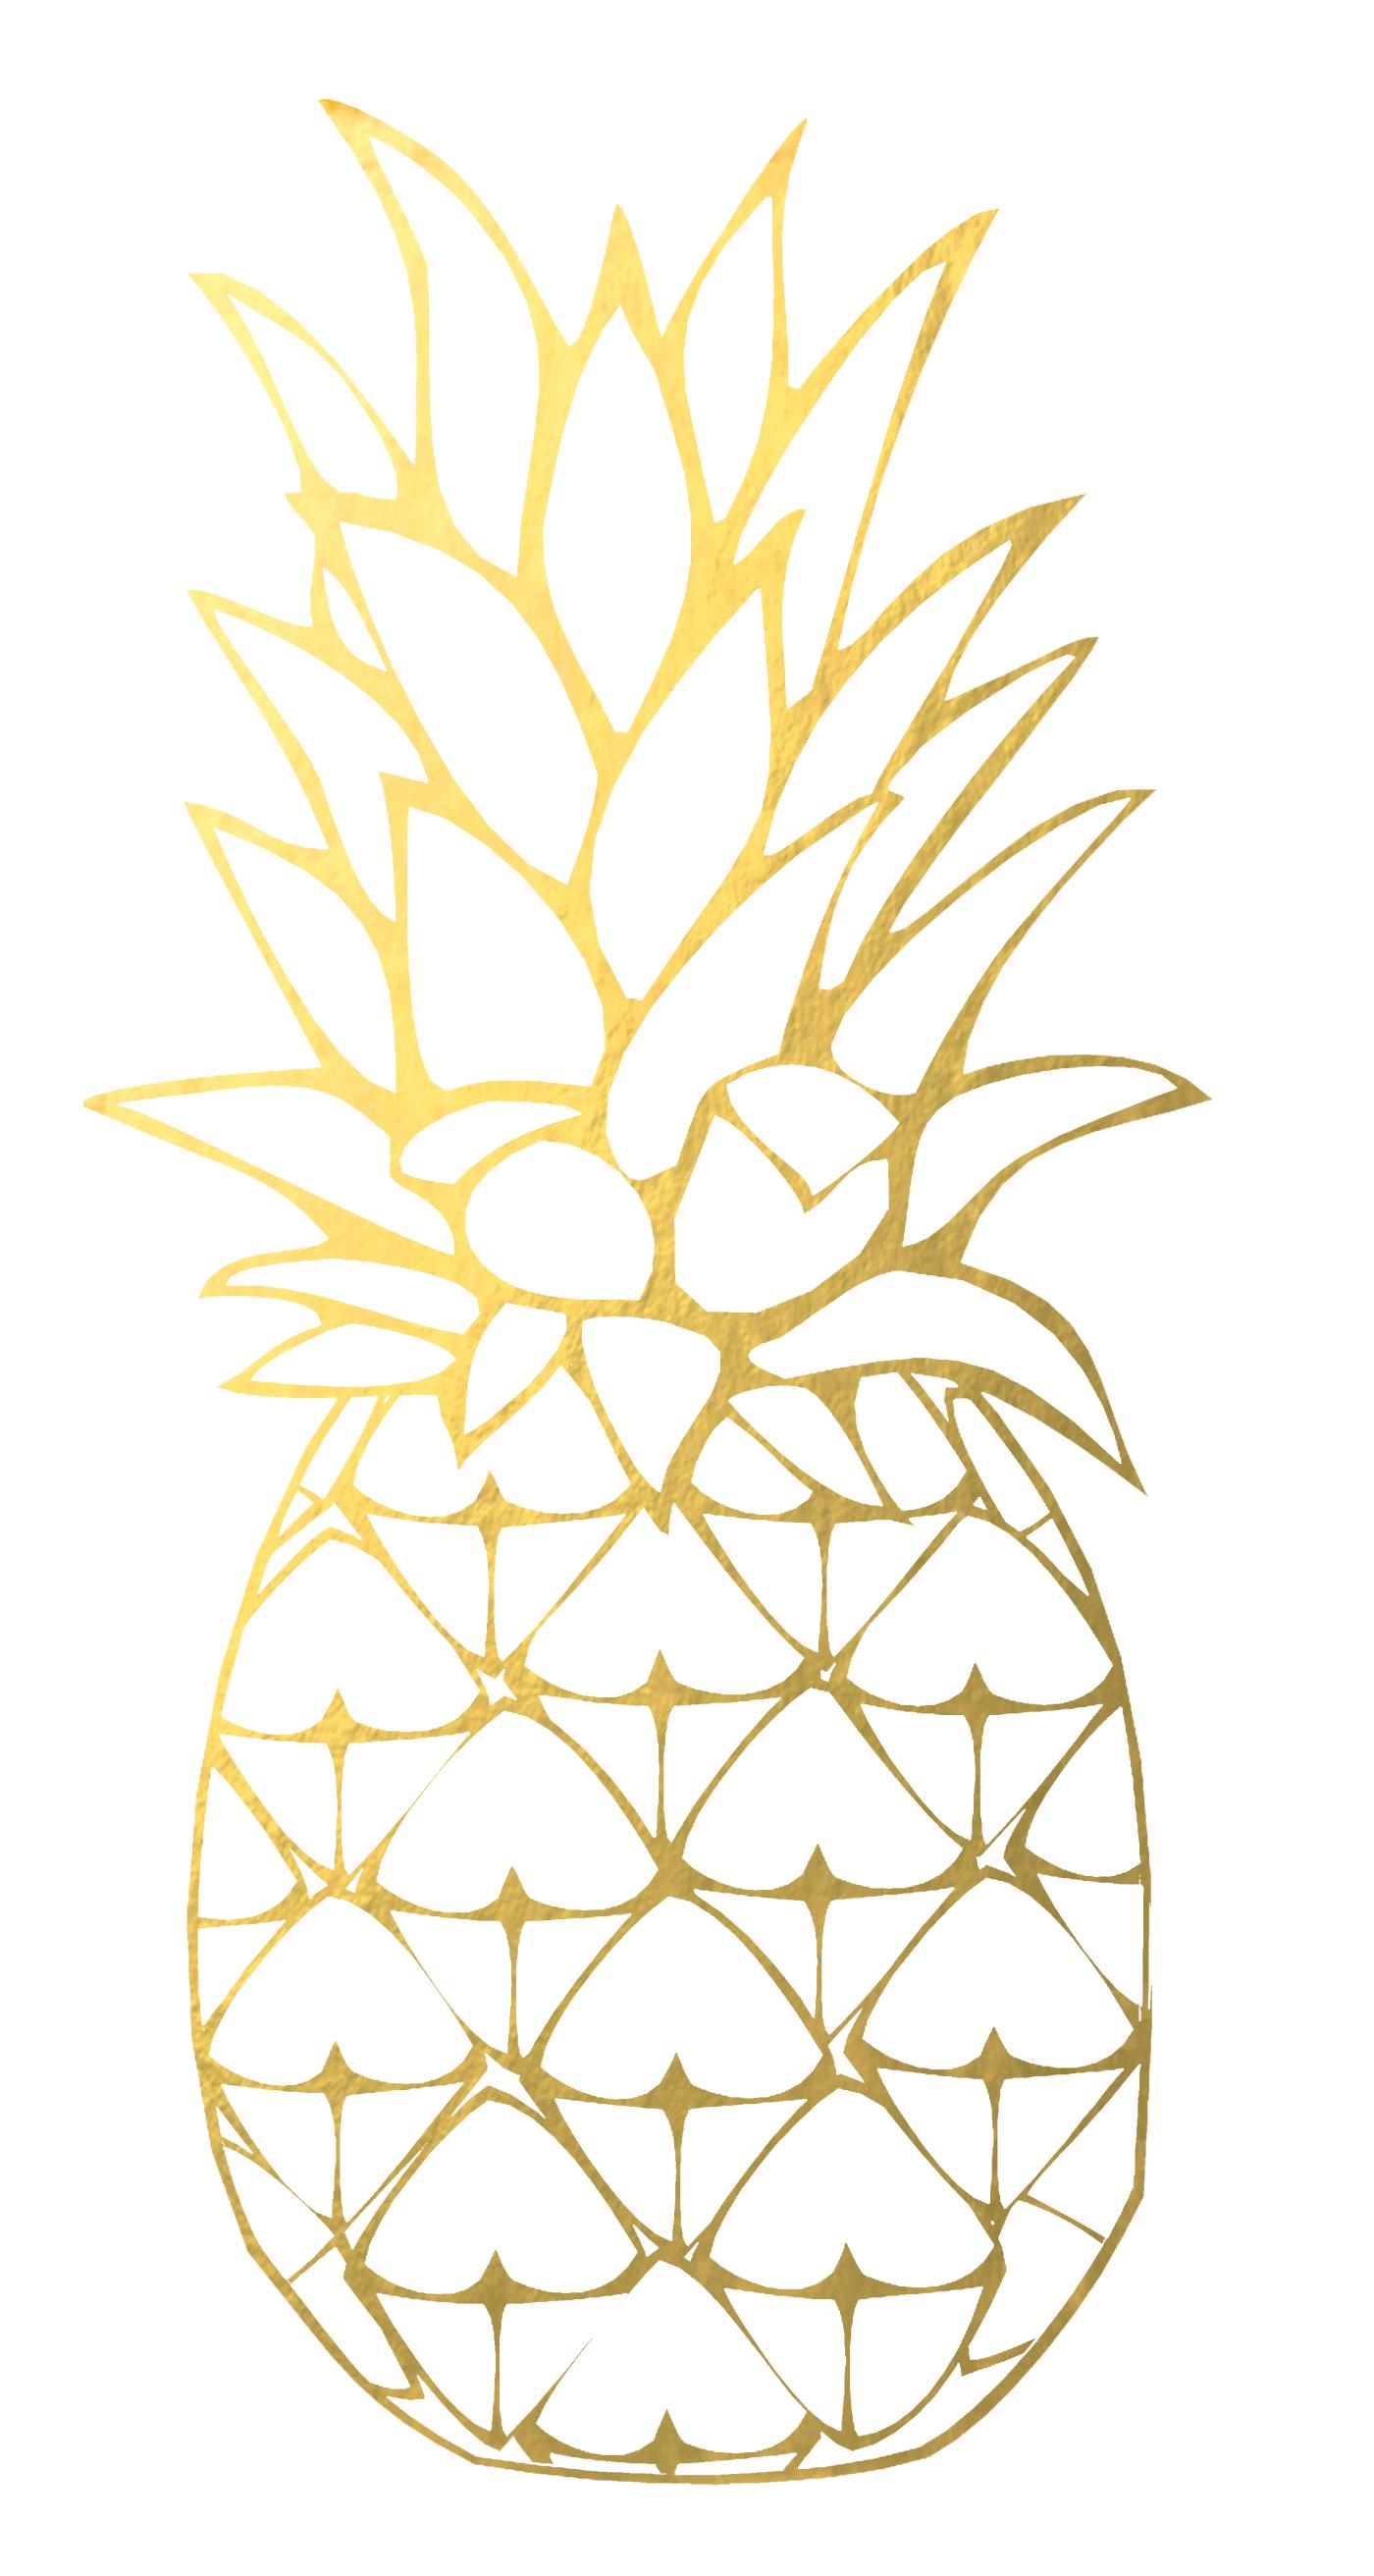 Pineapple clipart gold pineapple. Kawaii designs hawaii cupcake